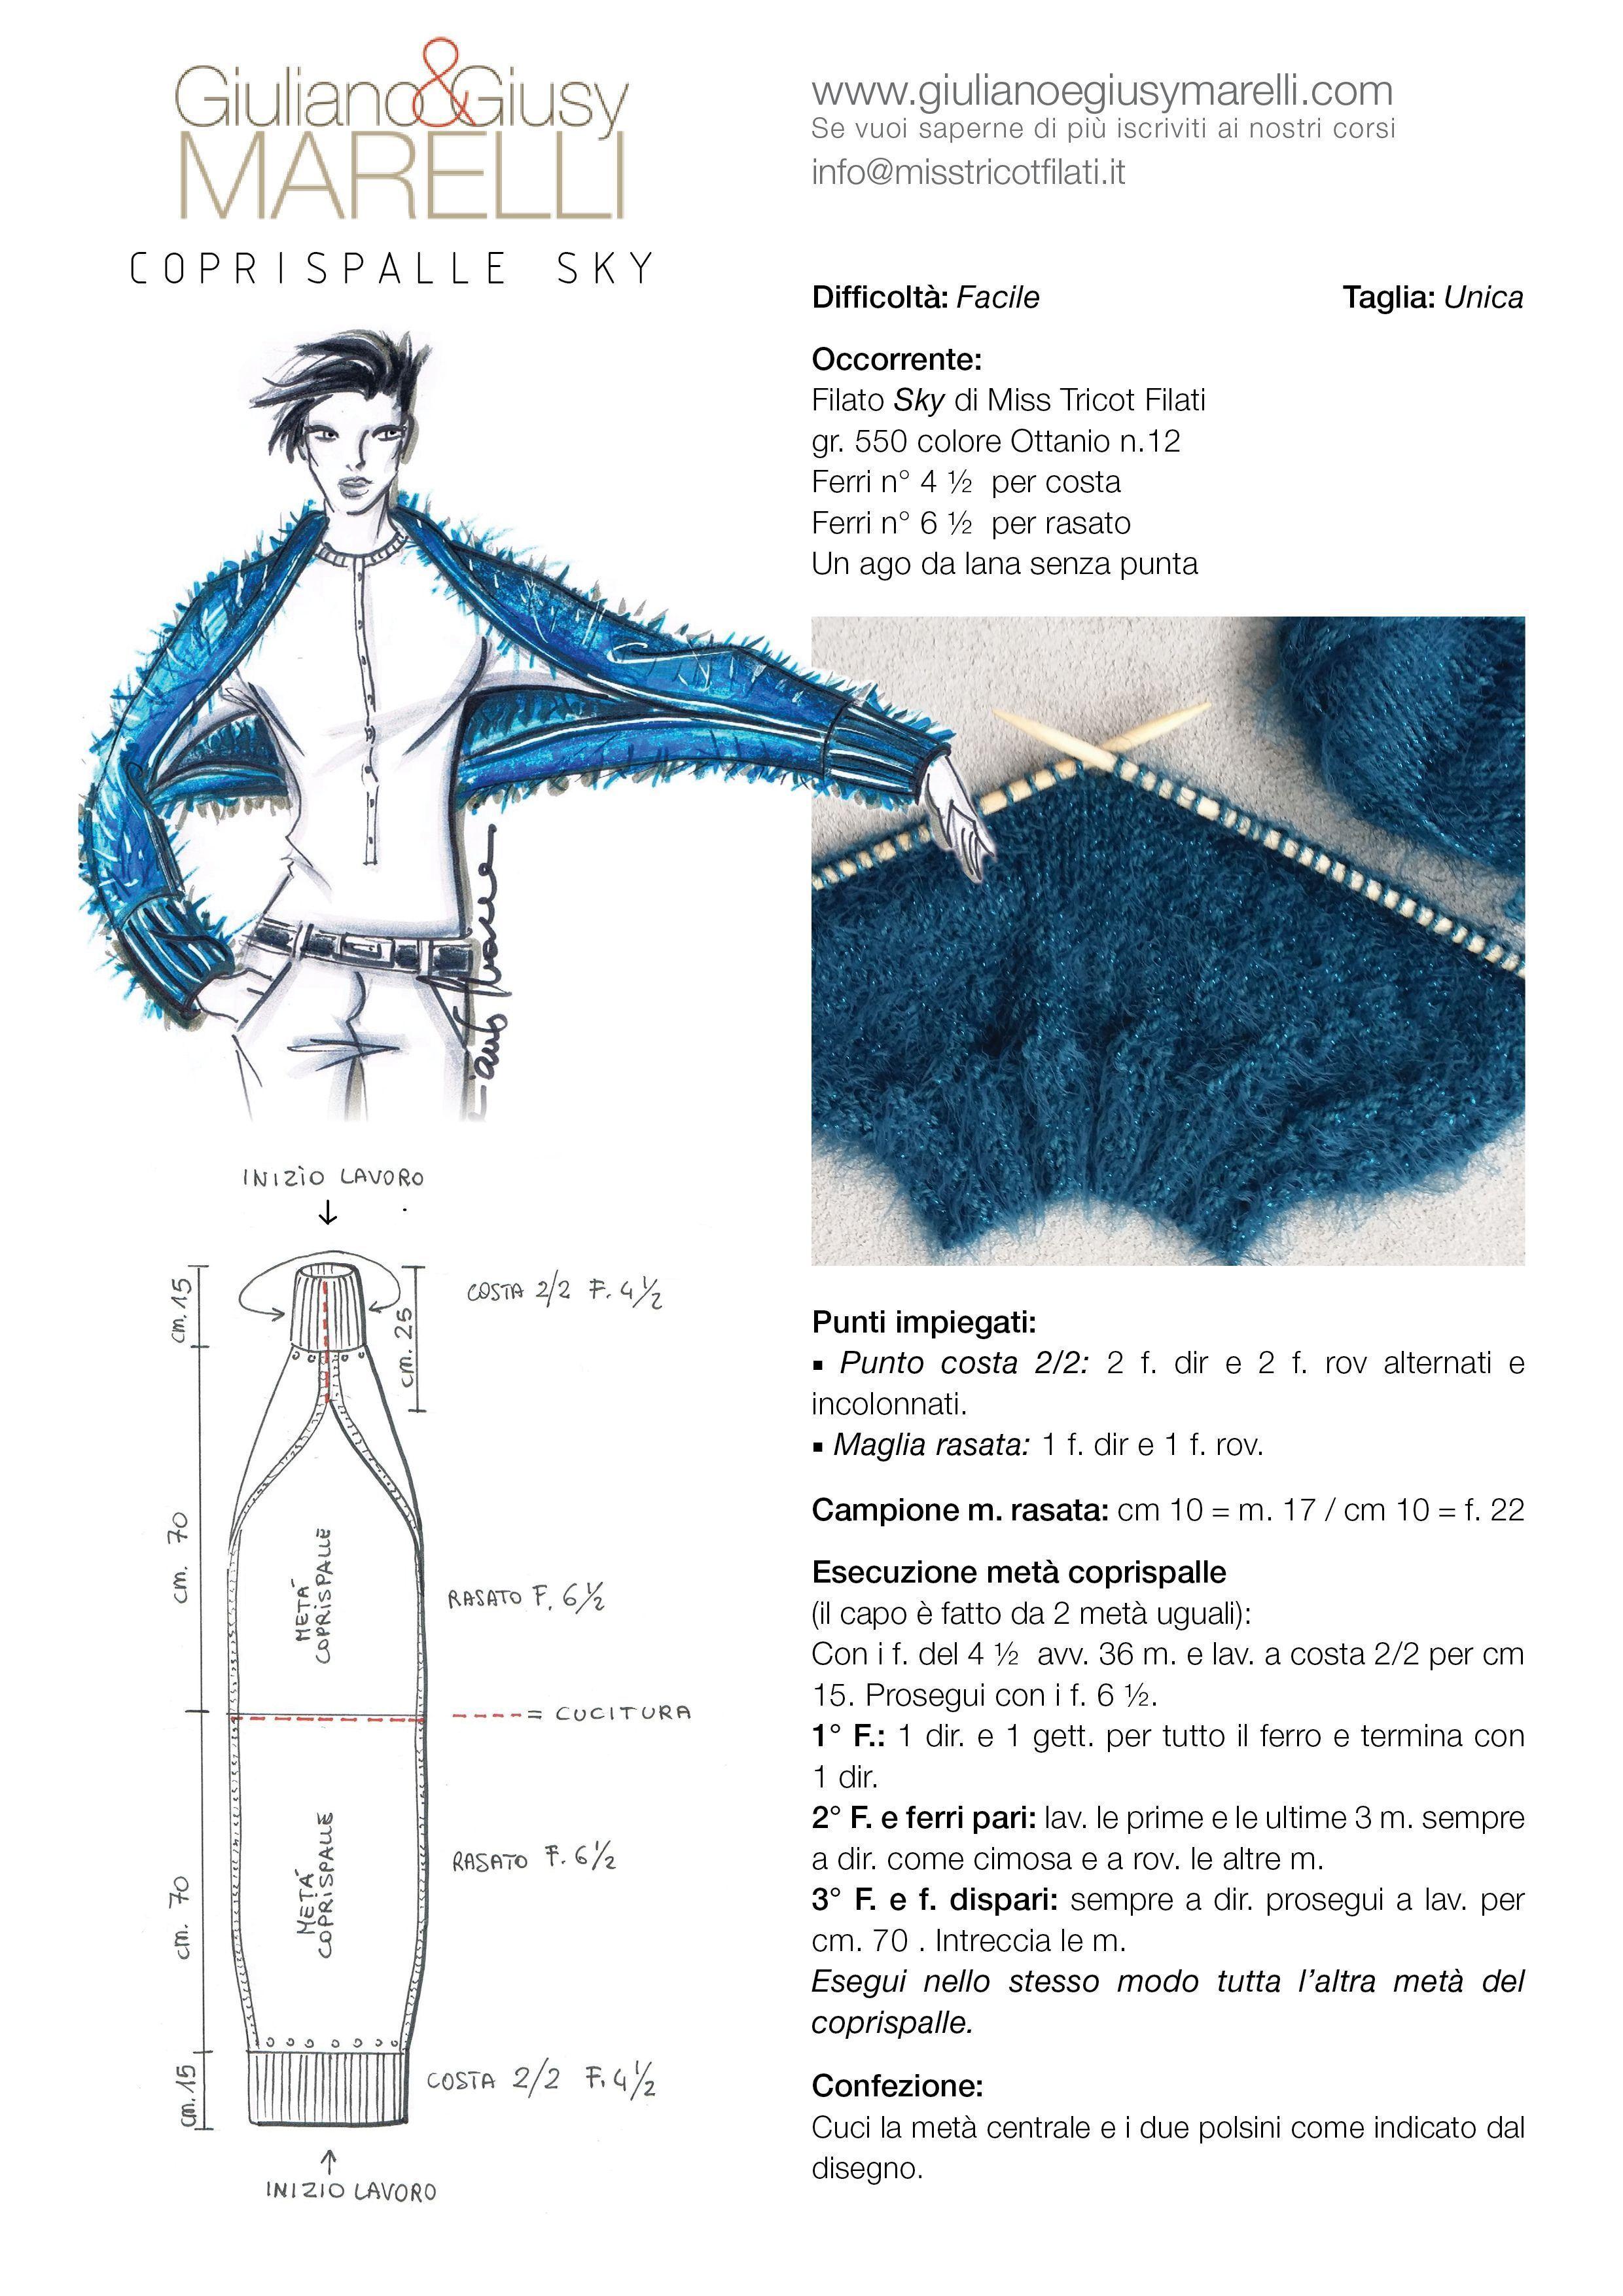 Photo of # Crochet scarf vest Giuliano & GiusyMarelli_MF_Coprispalle_Sky.jpg (2480 × 3508) #S …